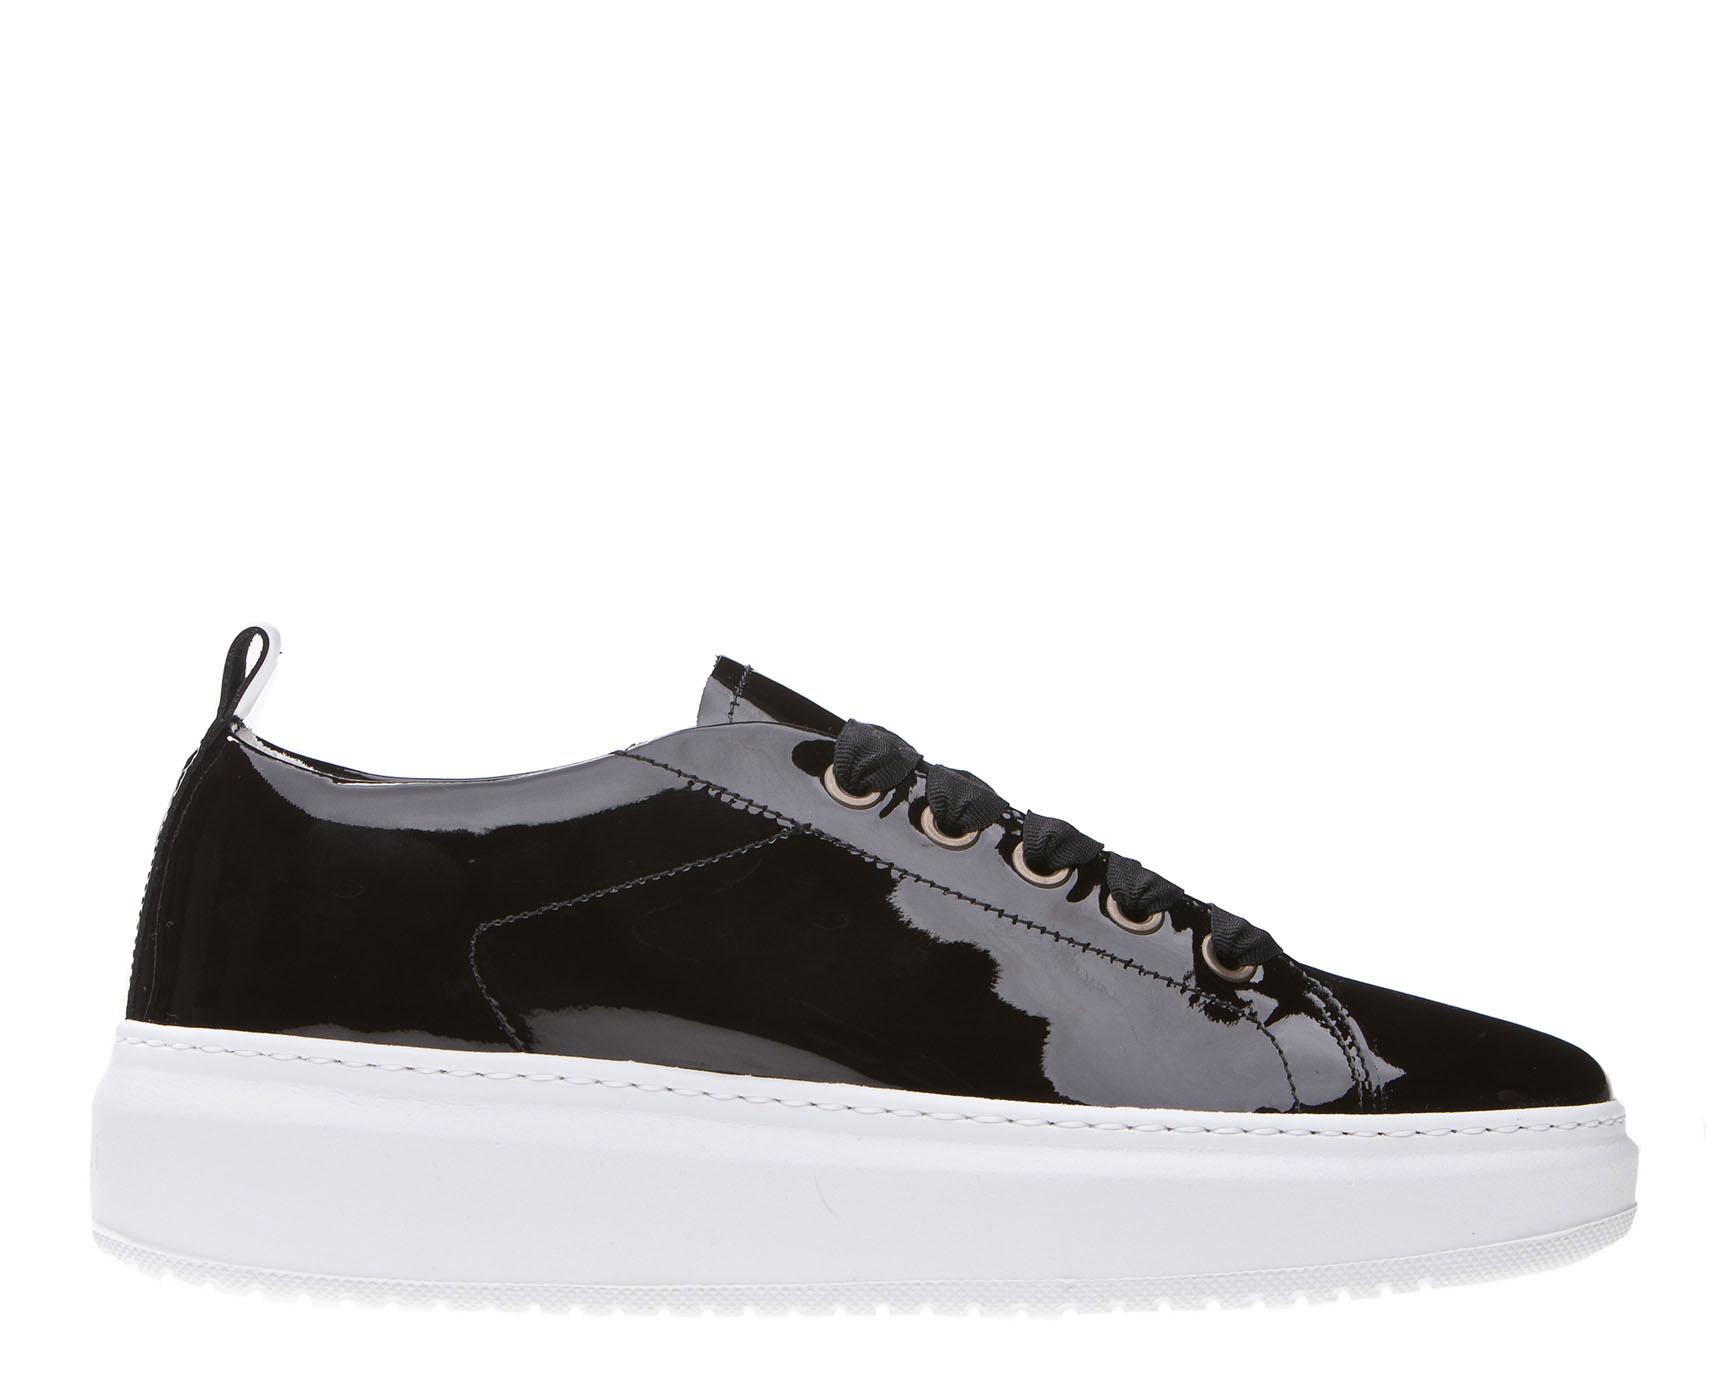 Sneakers - New York - Black